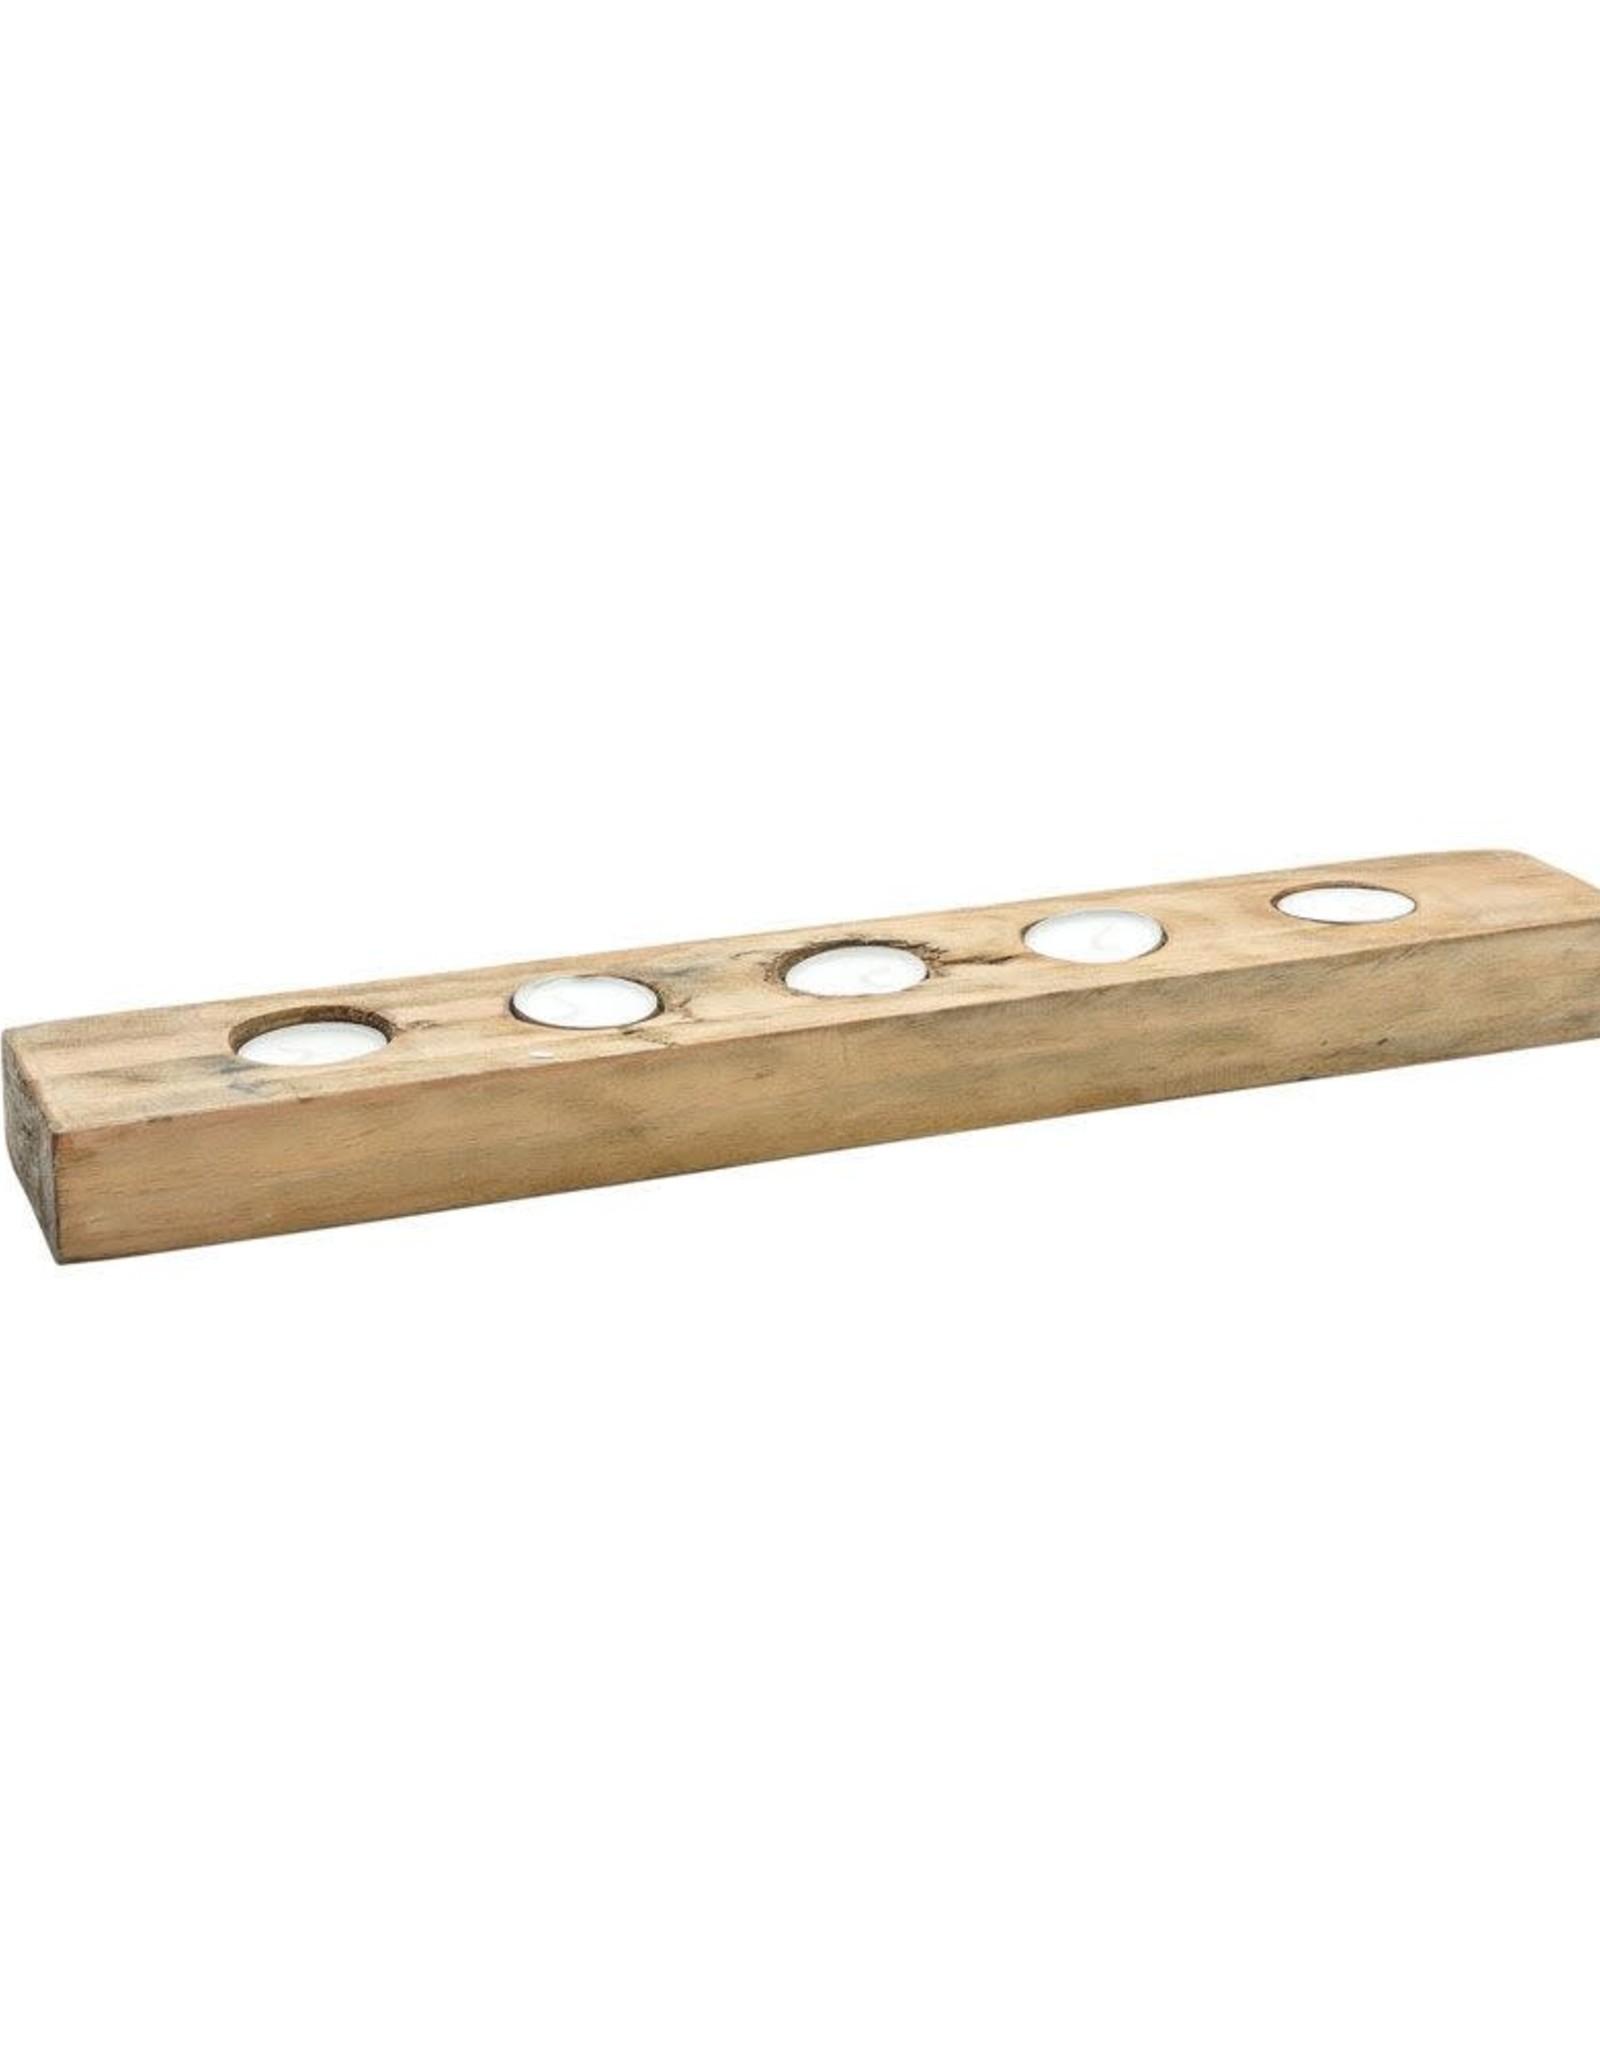 Light Plank Small 5pcs.-reclaimed wood